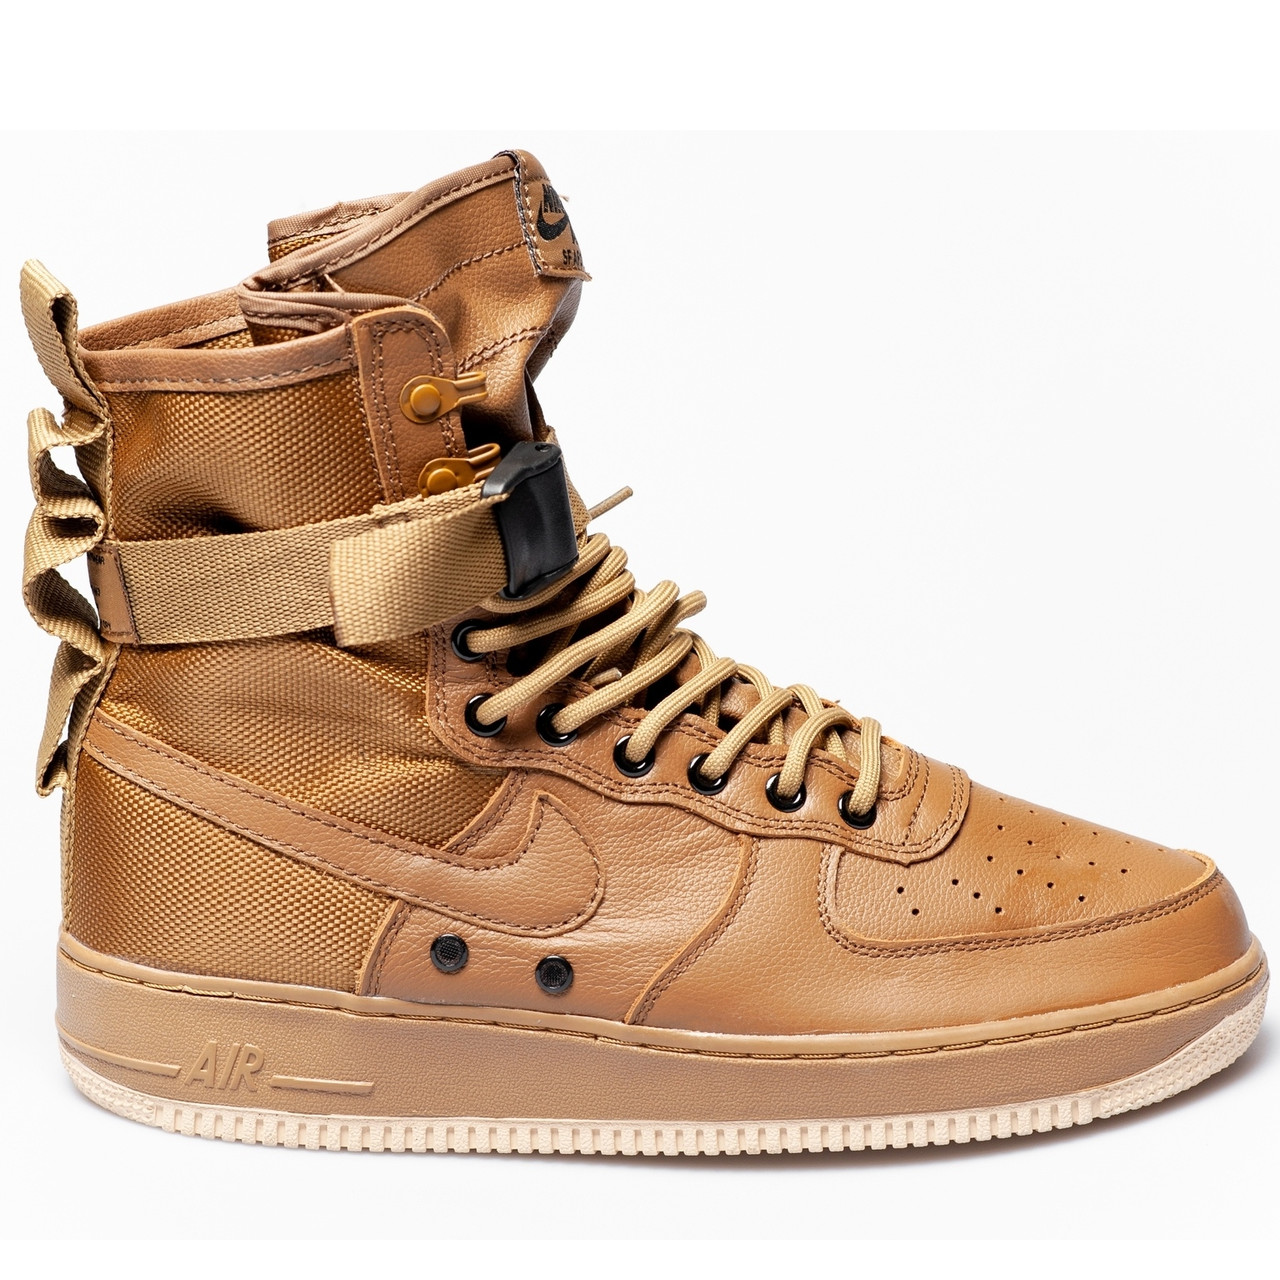 Кроссовки мужские Nike Air Force SF коричневые (Top replic)